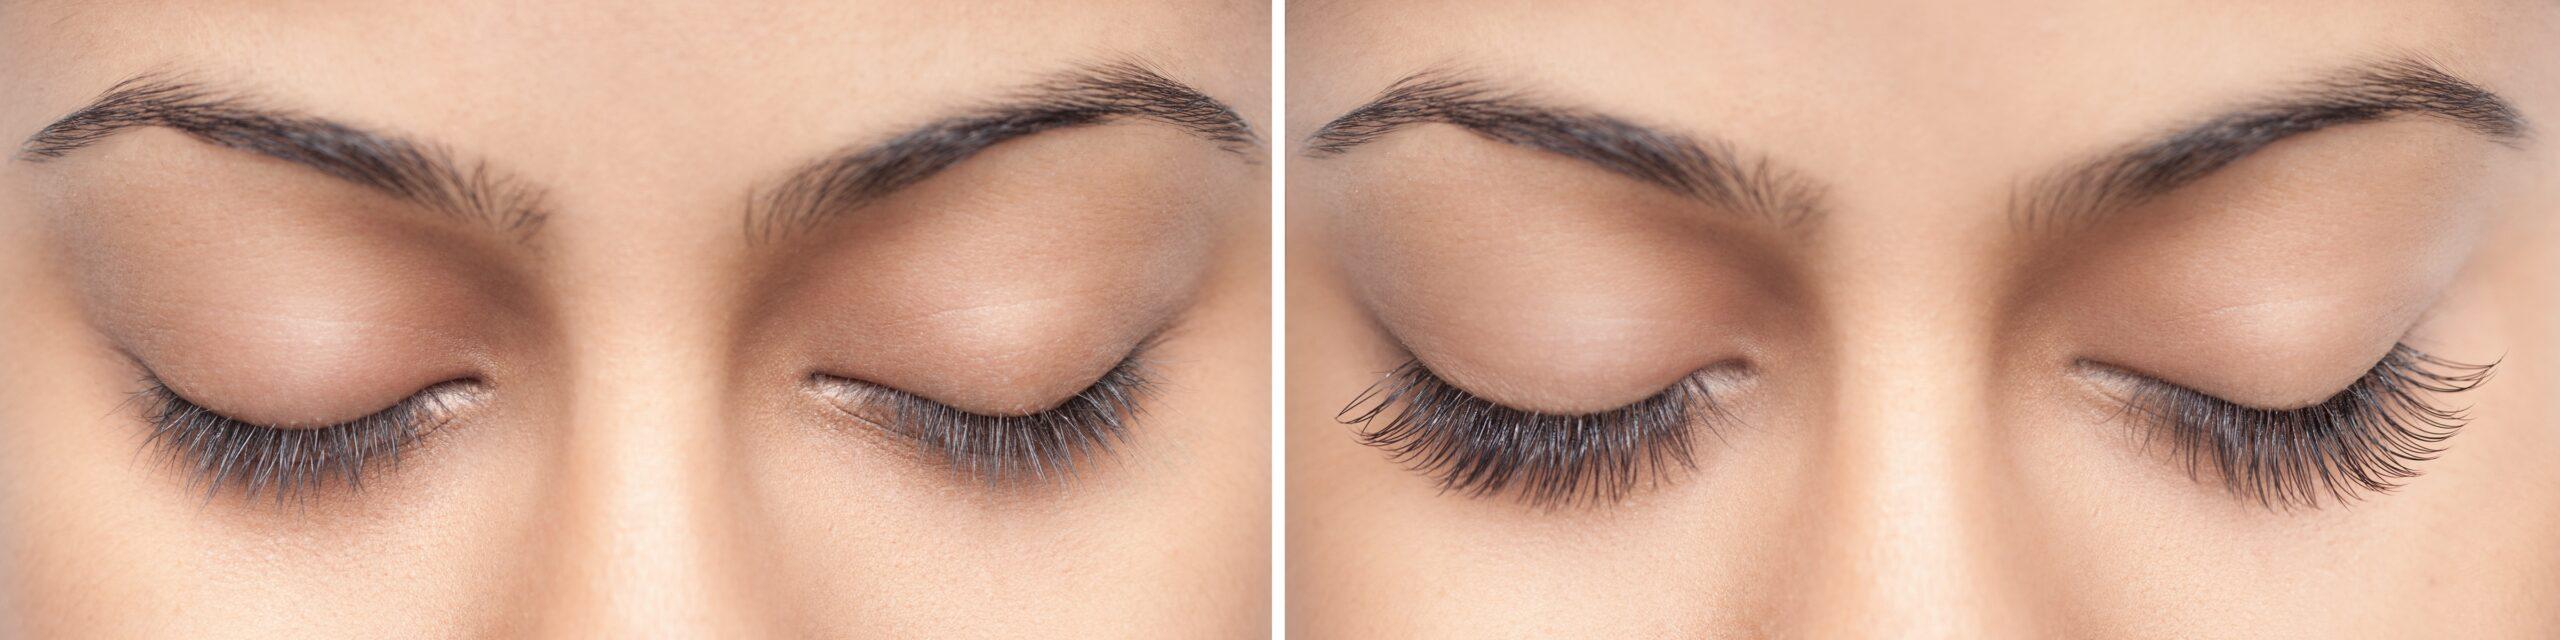 dramatic eyelash extensions